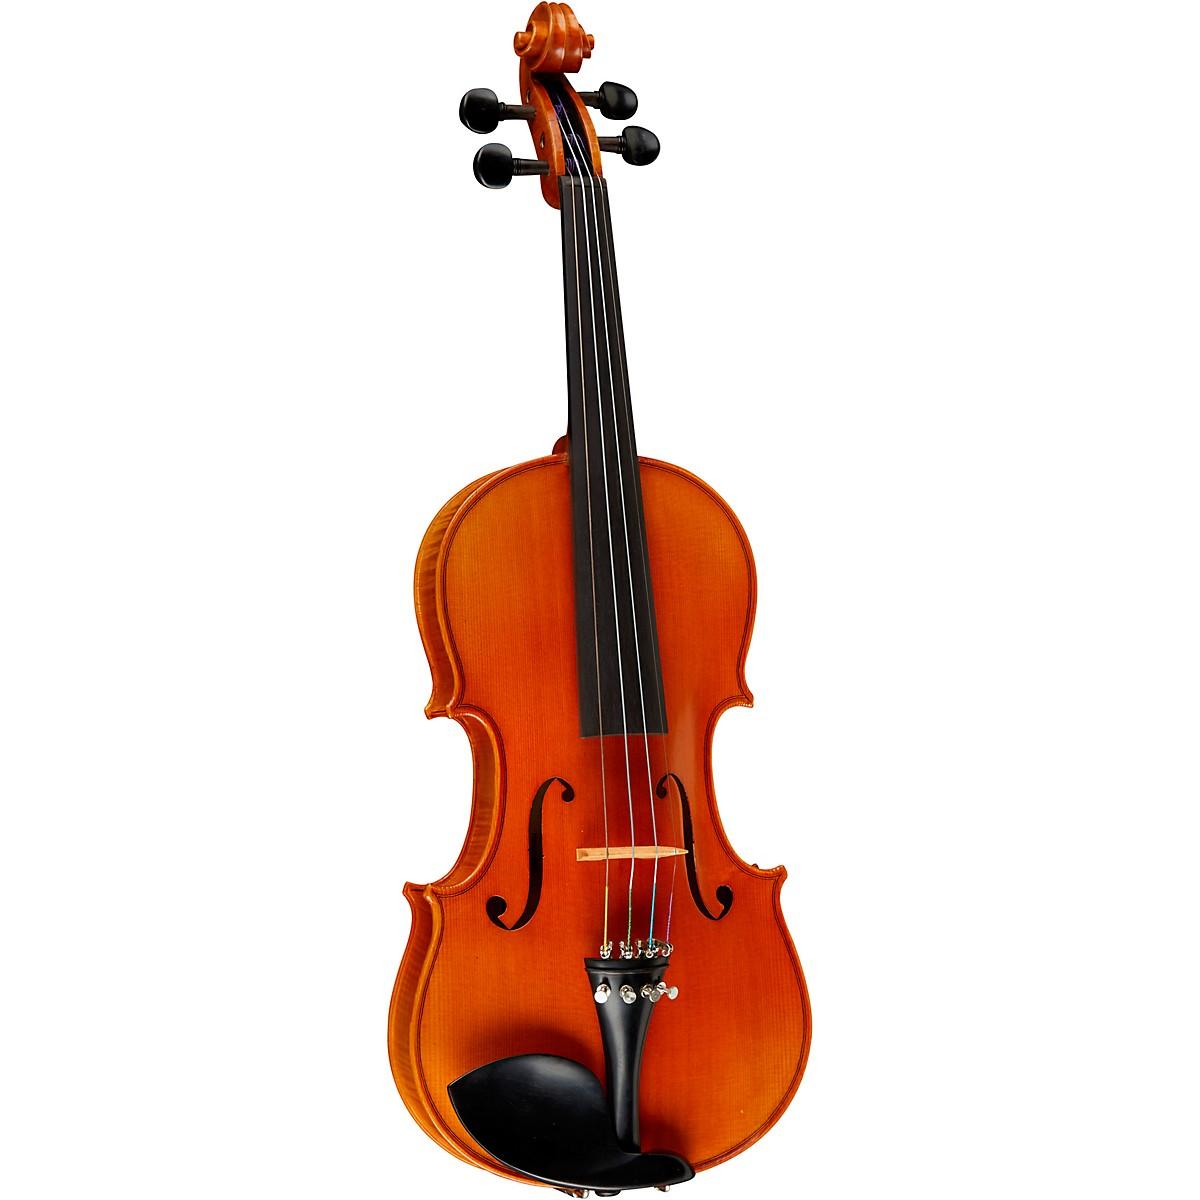 Karl Willhelm Model 44 Violin